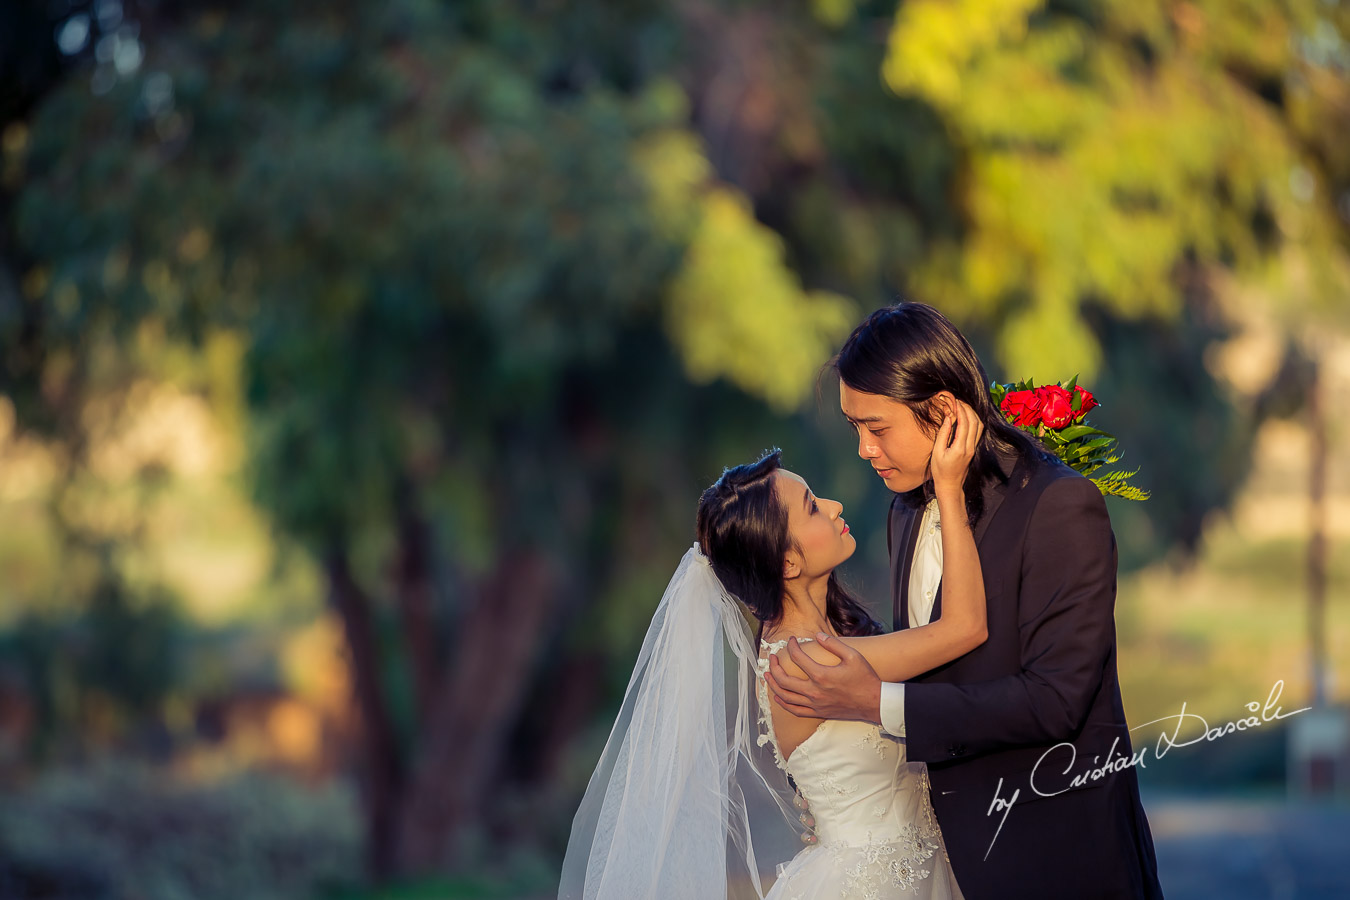 Pre Wedding Photoshoot in Cyprus - 10